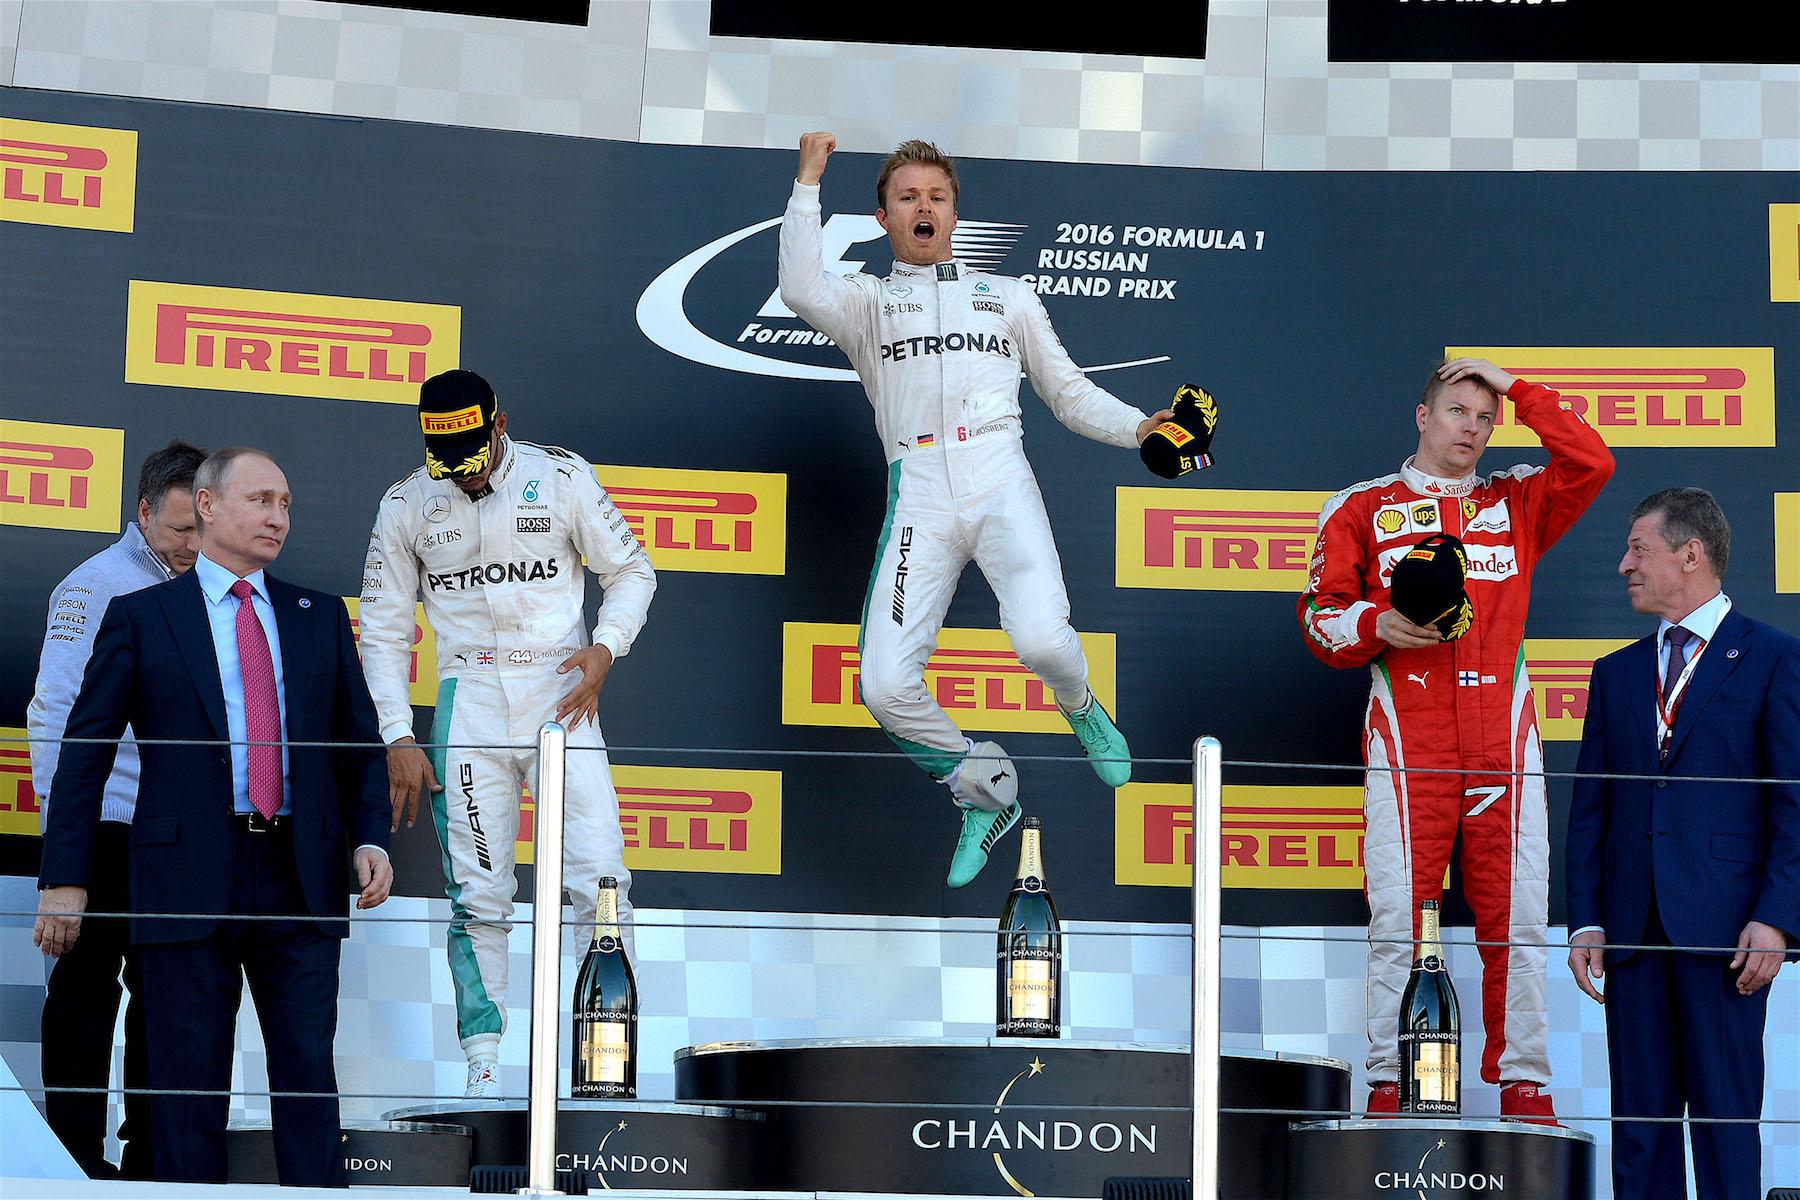 18 ROS jumping on Russia podium copy.jpg